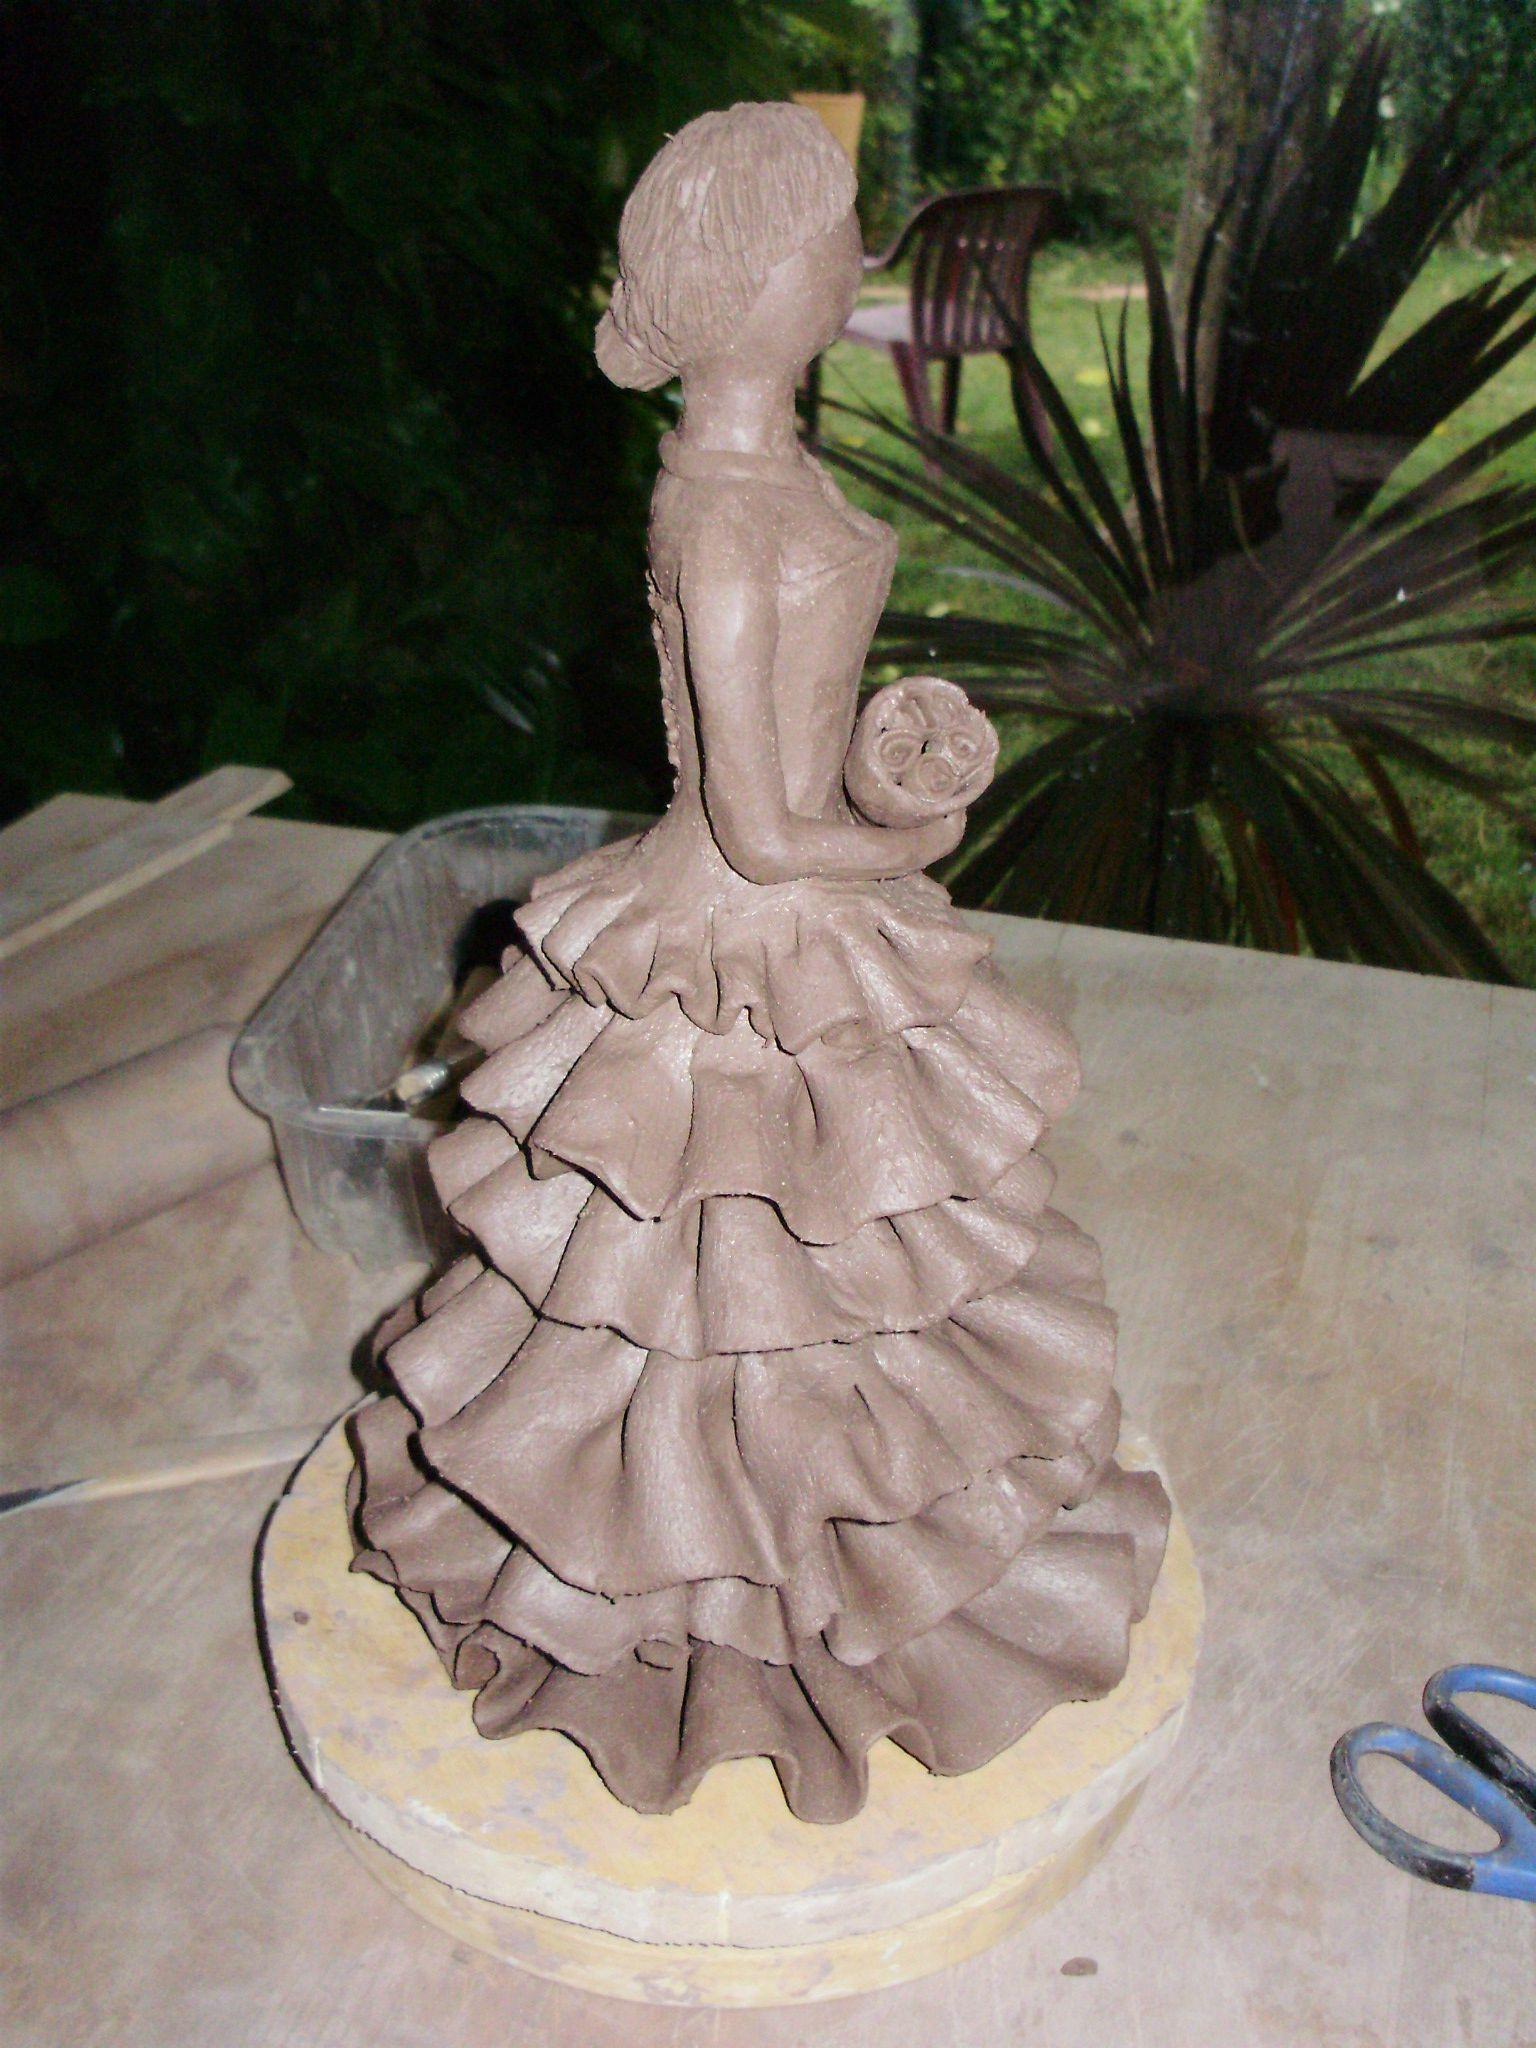 Ceramique Grande Robe Femme Grande Robe Femme Robe Ceramique Femme Ceramique Ceramique Grande Femme sQtrhd